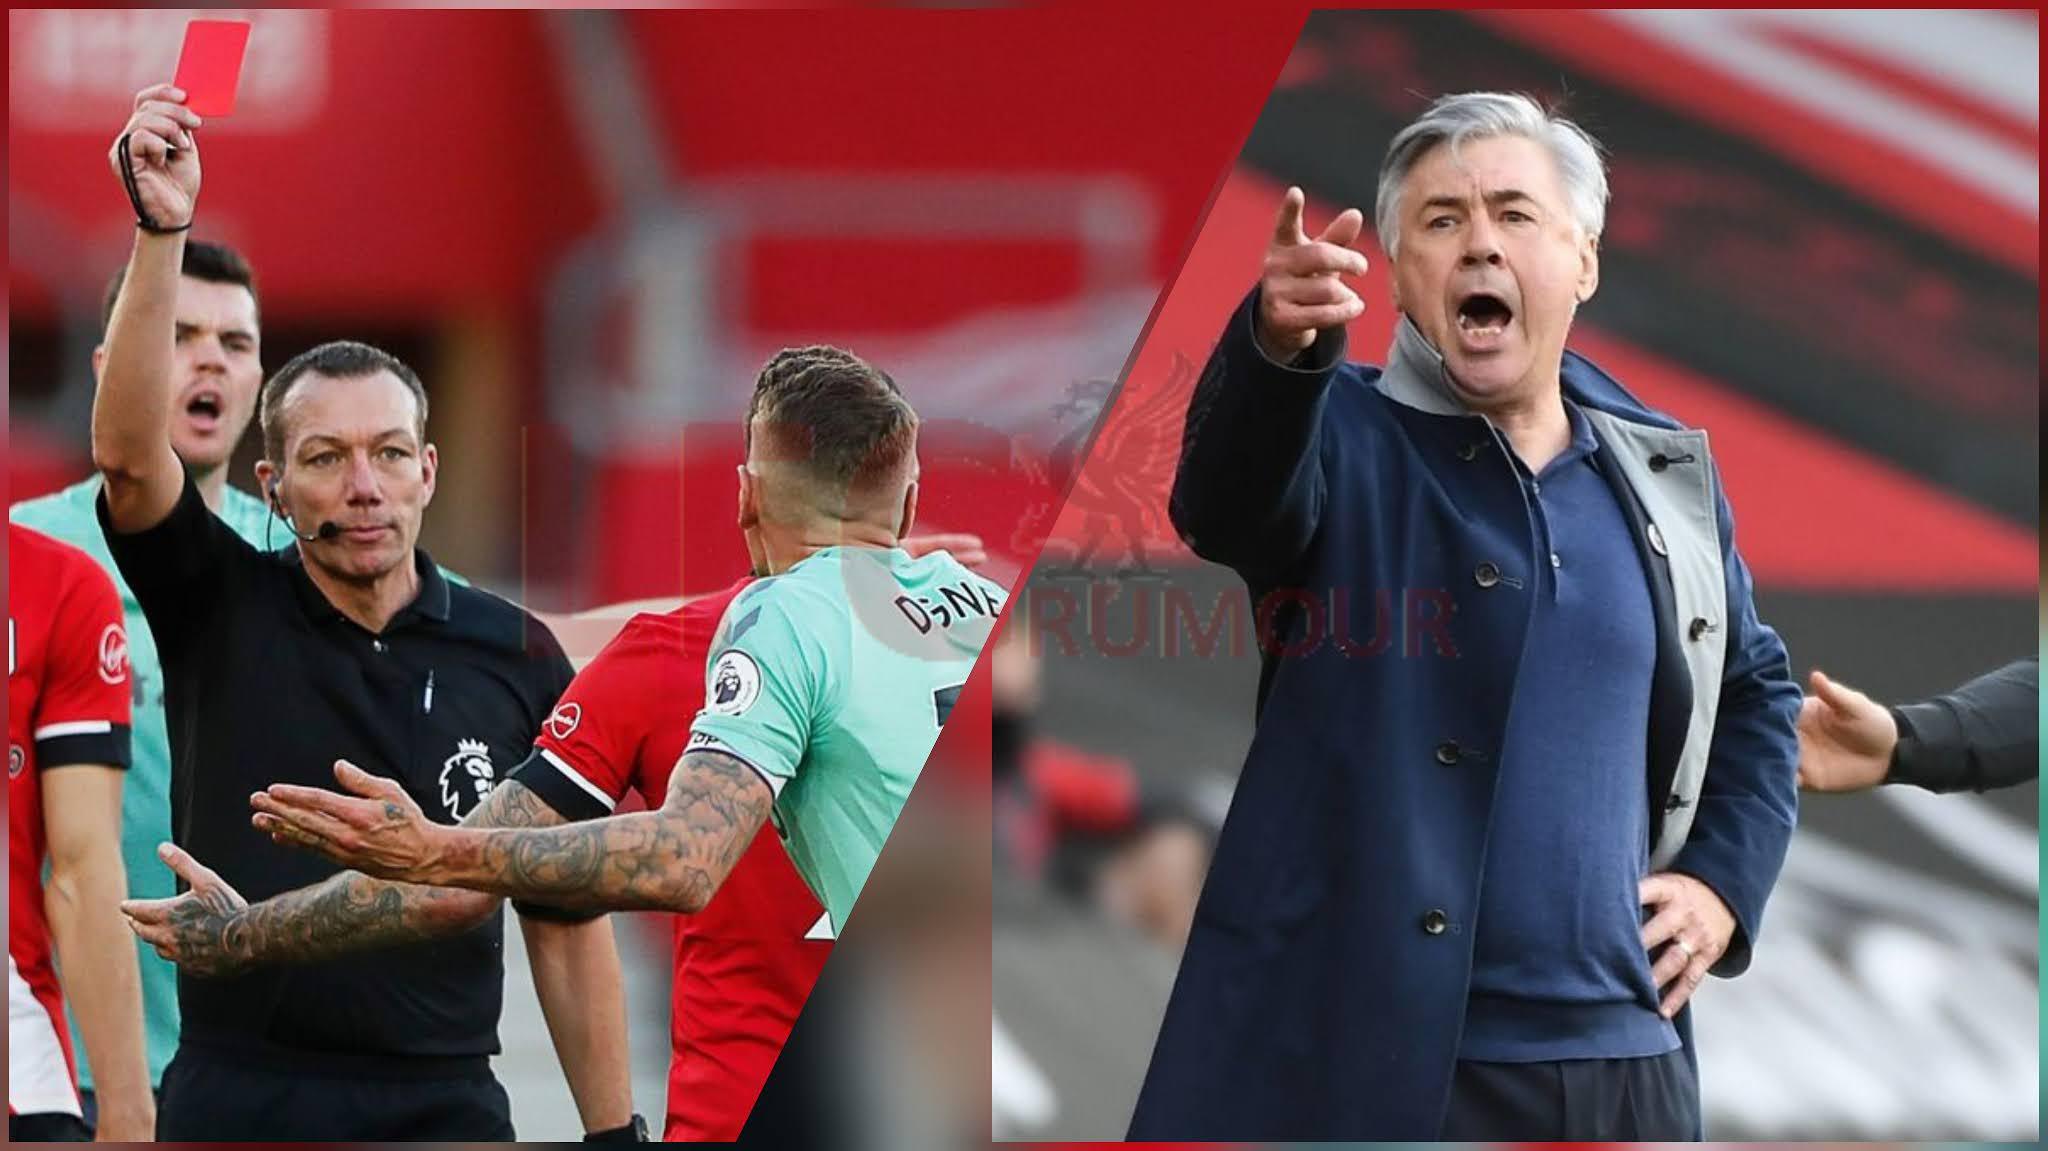 Carlo Ancelotti blasts referee red card decision in Southampton's 2-0 win over Everton.